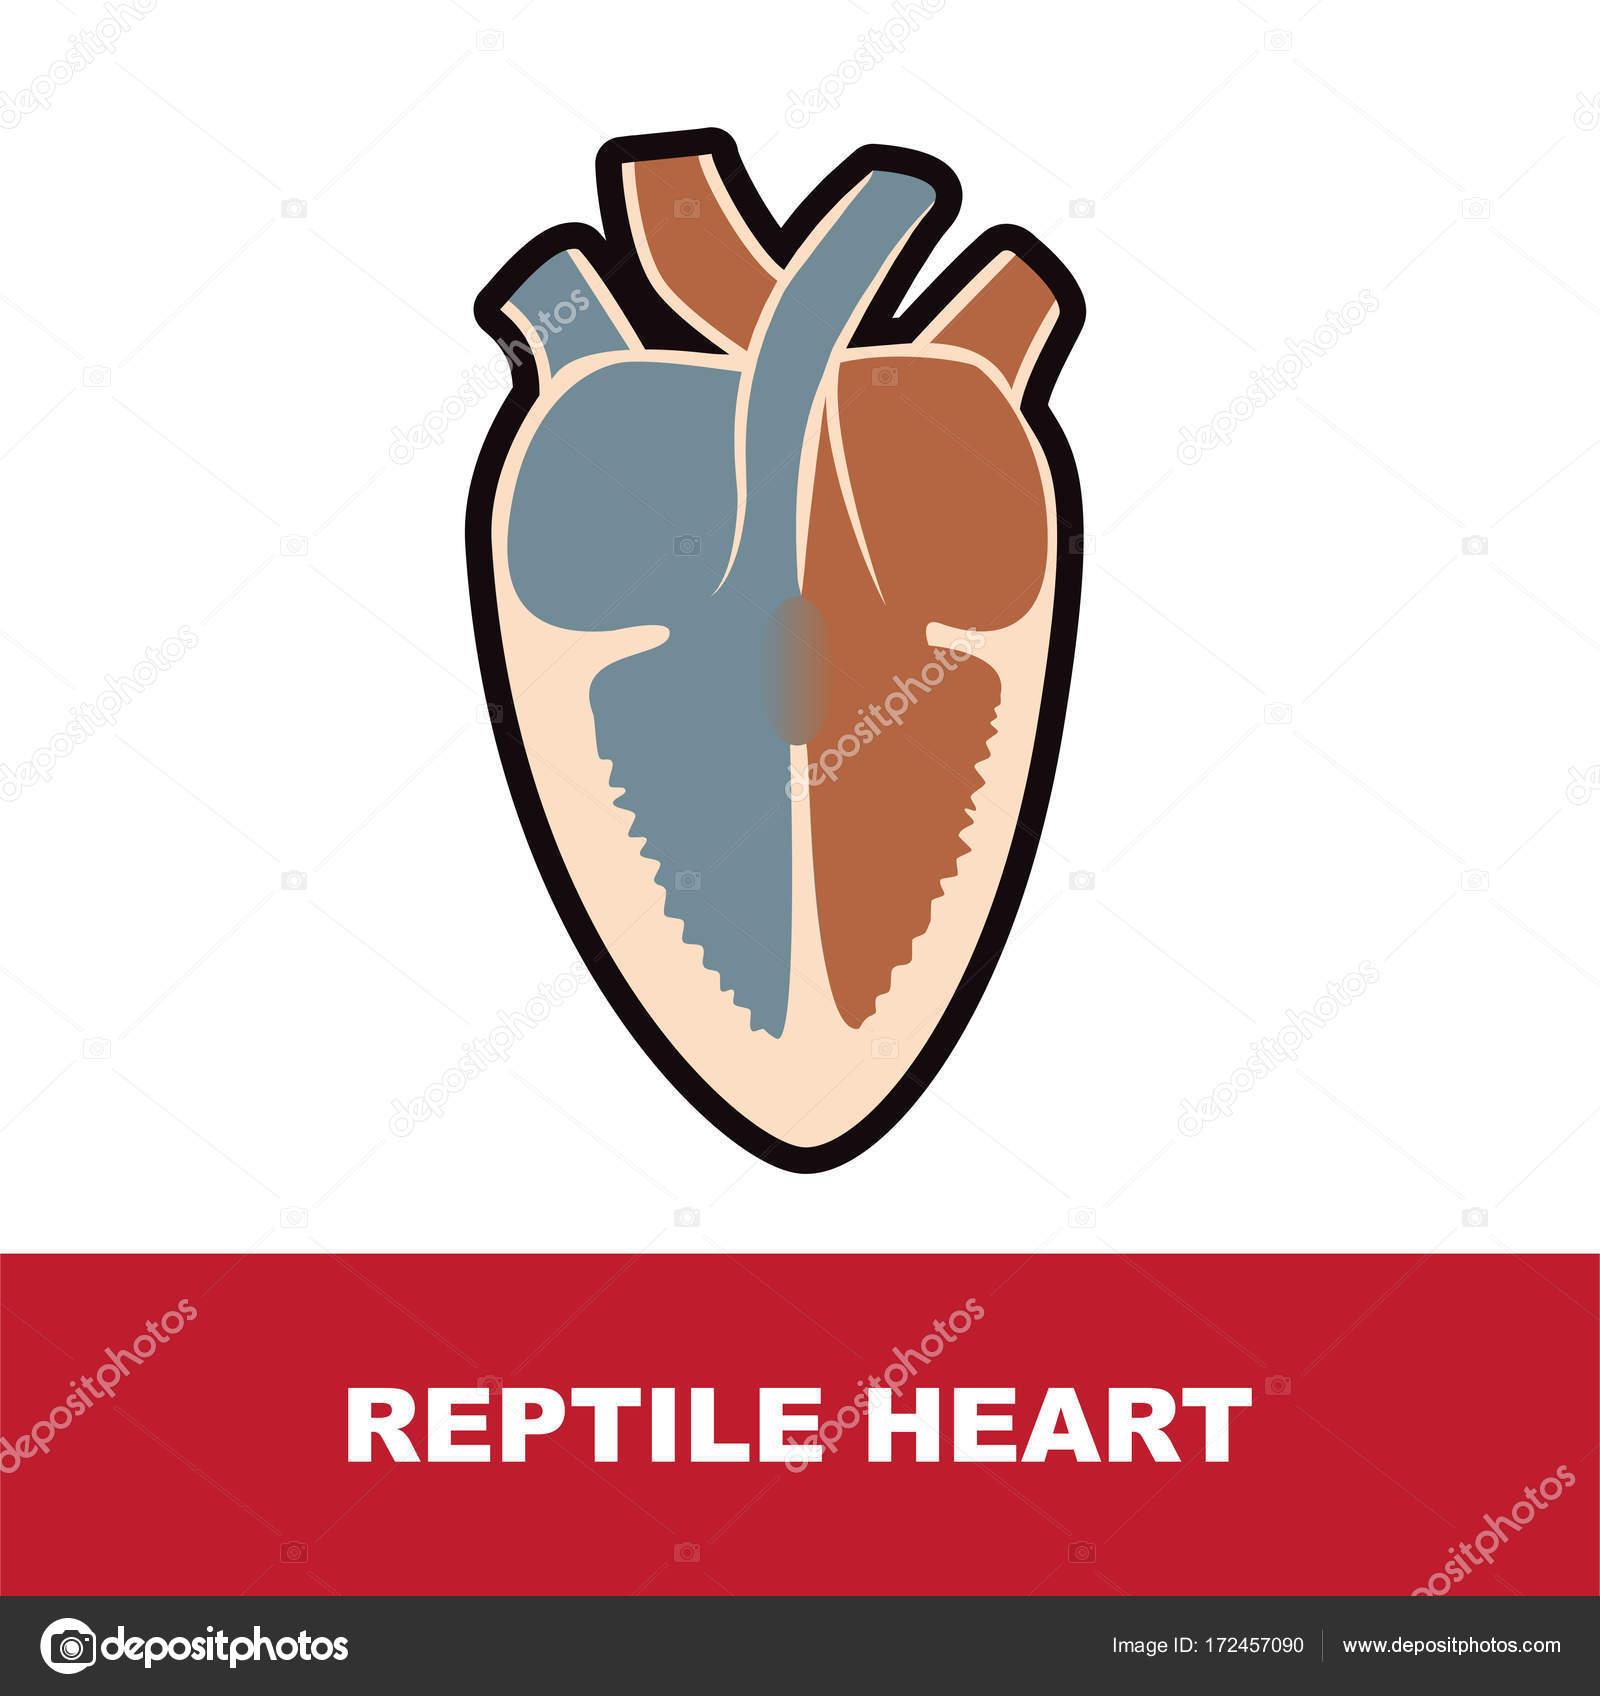 Reptile heart anatomy stock vector paveu 172457090 reptile schematic heart anatomy vector illustration on white vector by paveu ccuart Choice Image